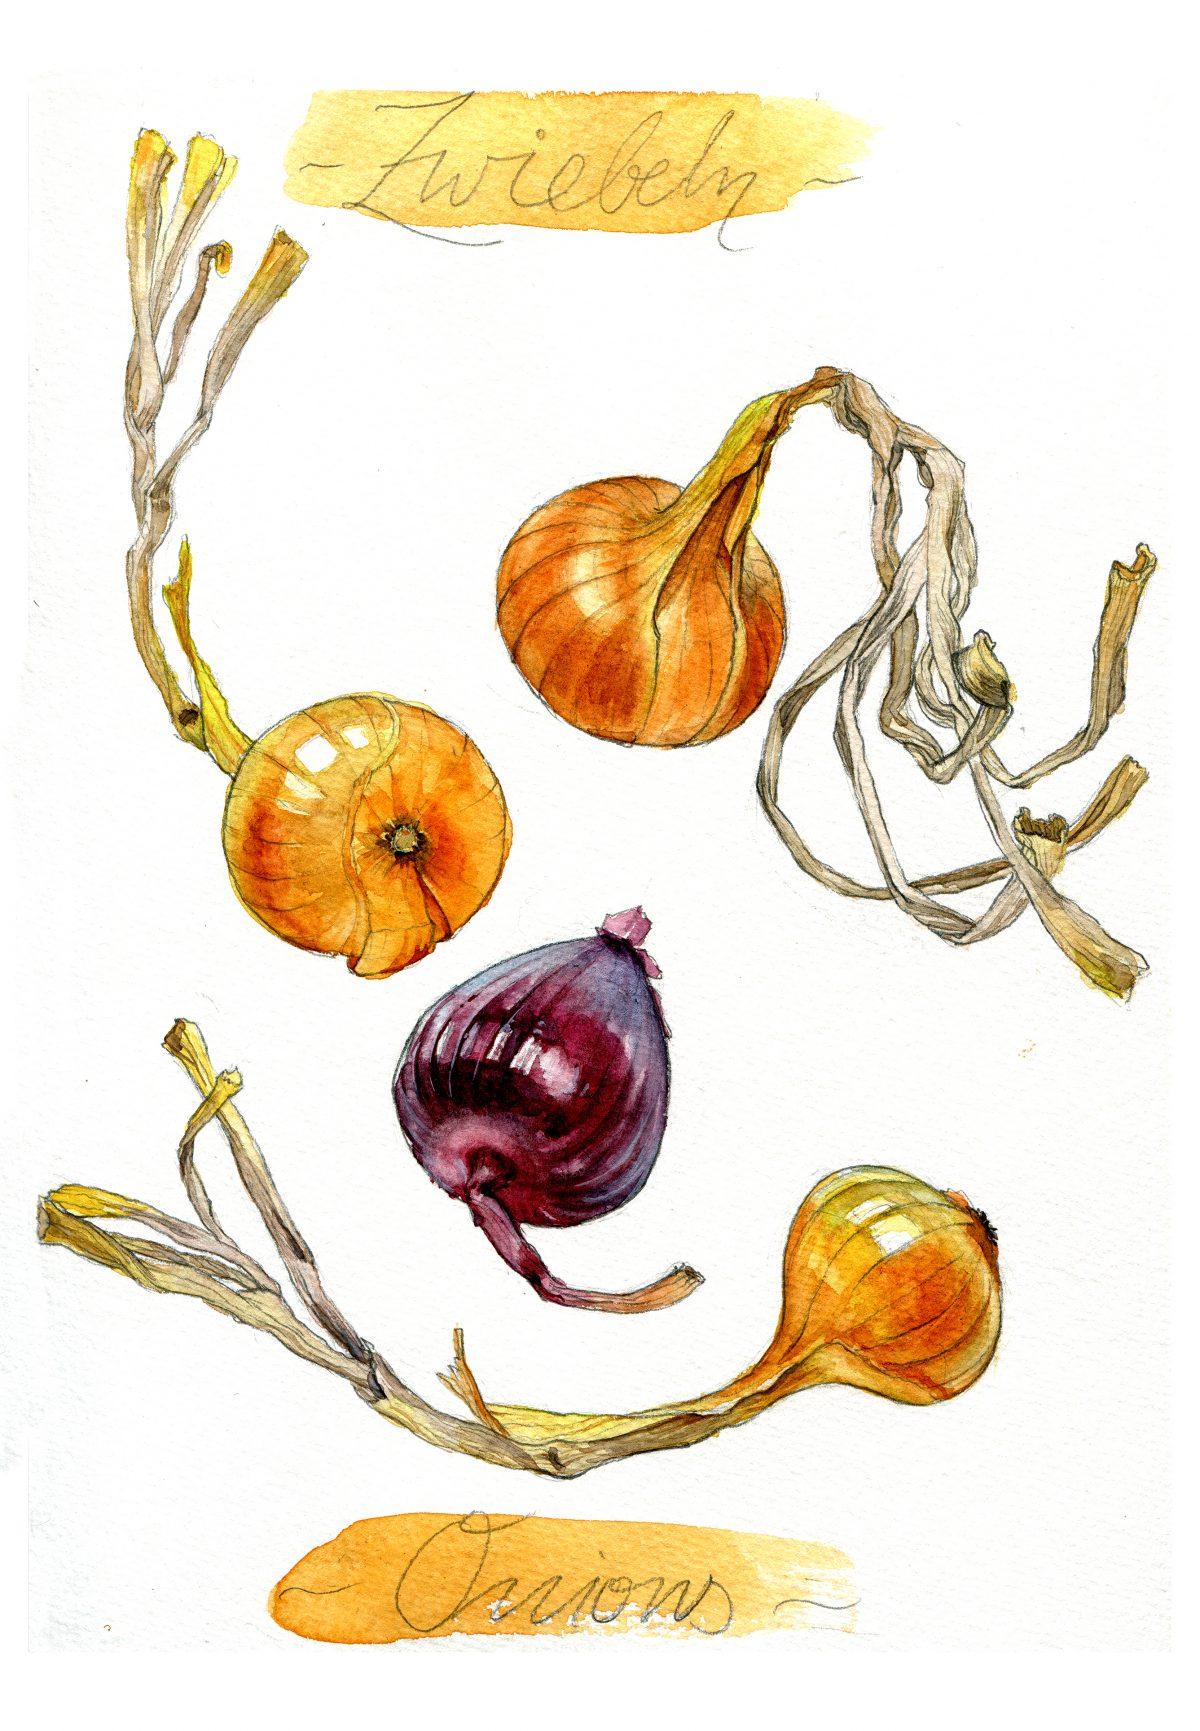 Zwiebeln, Aquarell, food illustration